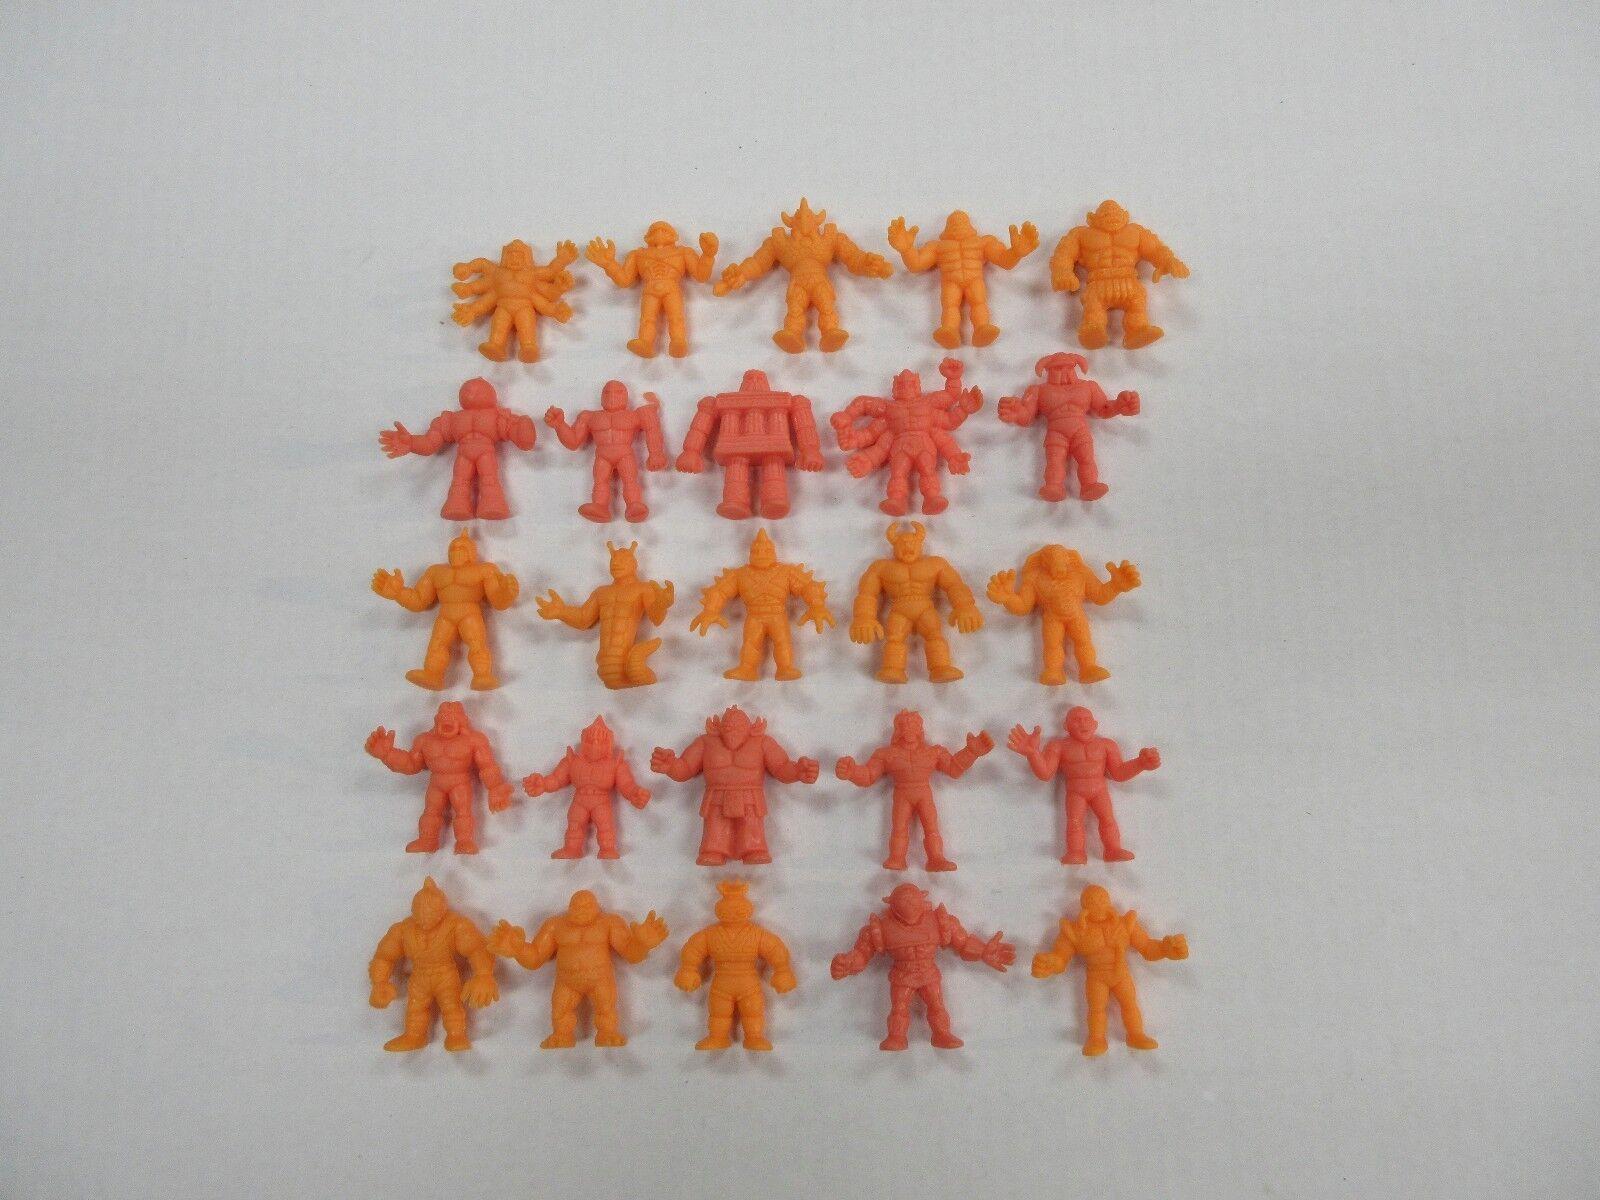 1980 ist jahrgang mattel m.u.s.c.l.e. muskel - männer 25 abbildung Orange menge